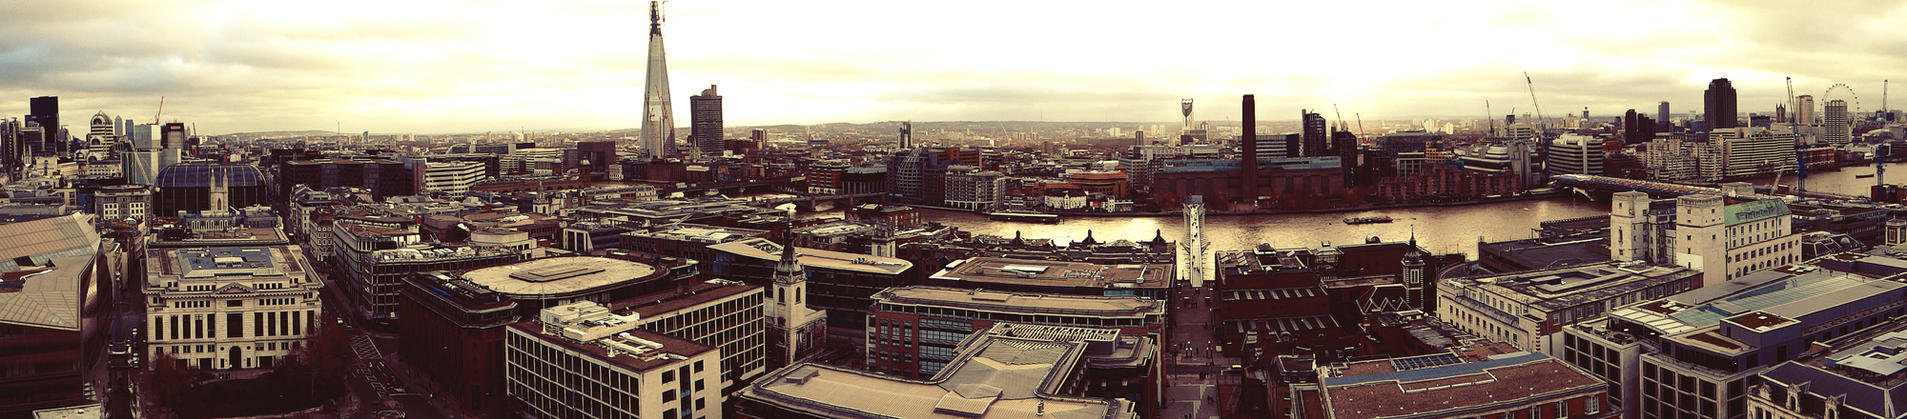 London Skyline Edit -Awesome- by JackHayden